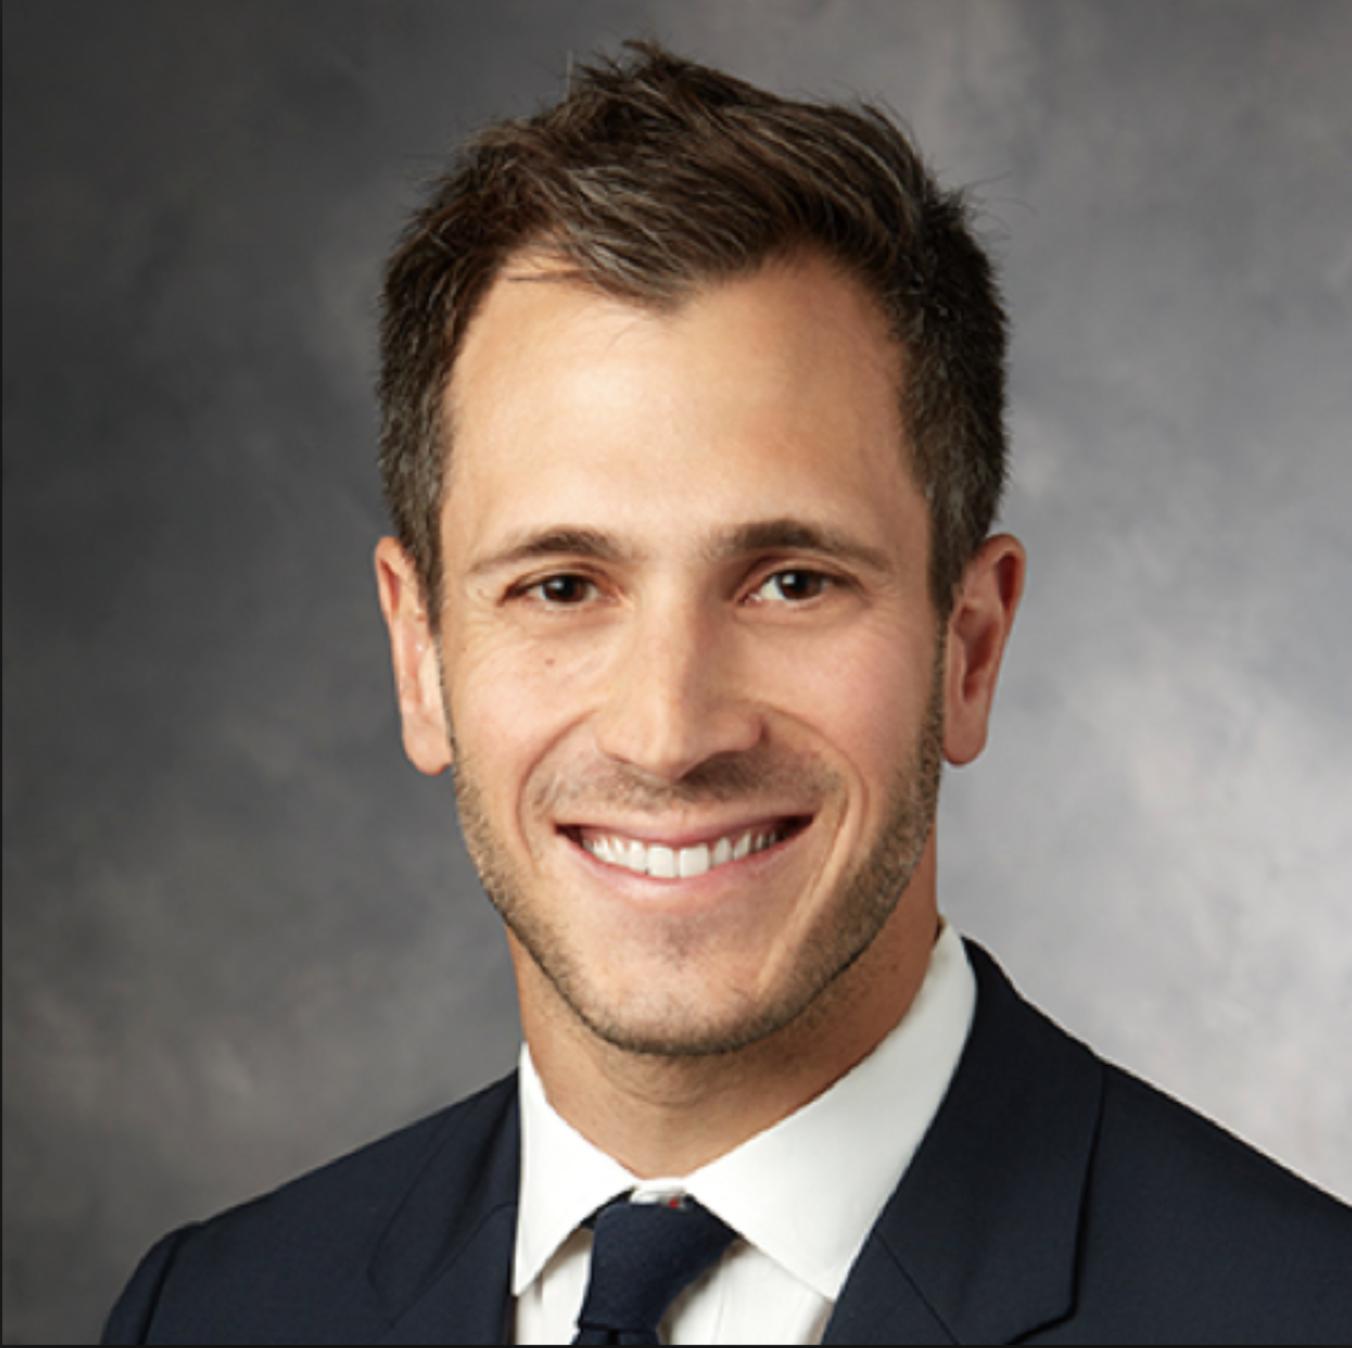 Dr. David Stark, Neurologist, Biomedical Informatician, Assistant Professor of Health System Design, Icahn School of Medicine at Mount Sinai